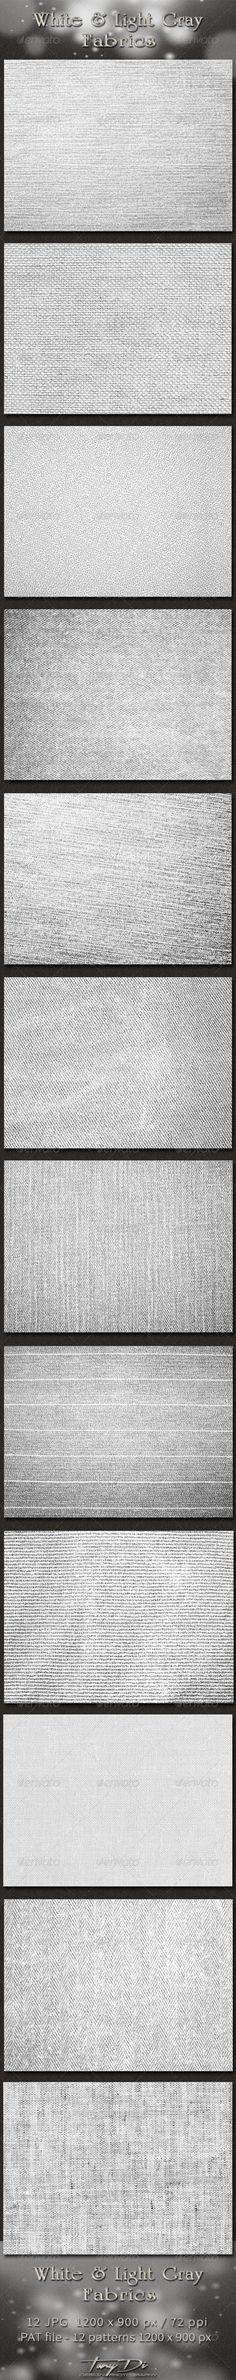 White and Light Gray Fabrics - $4